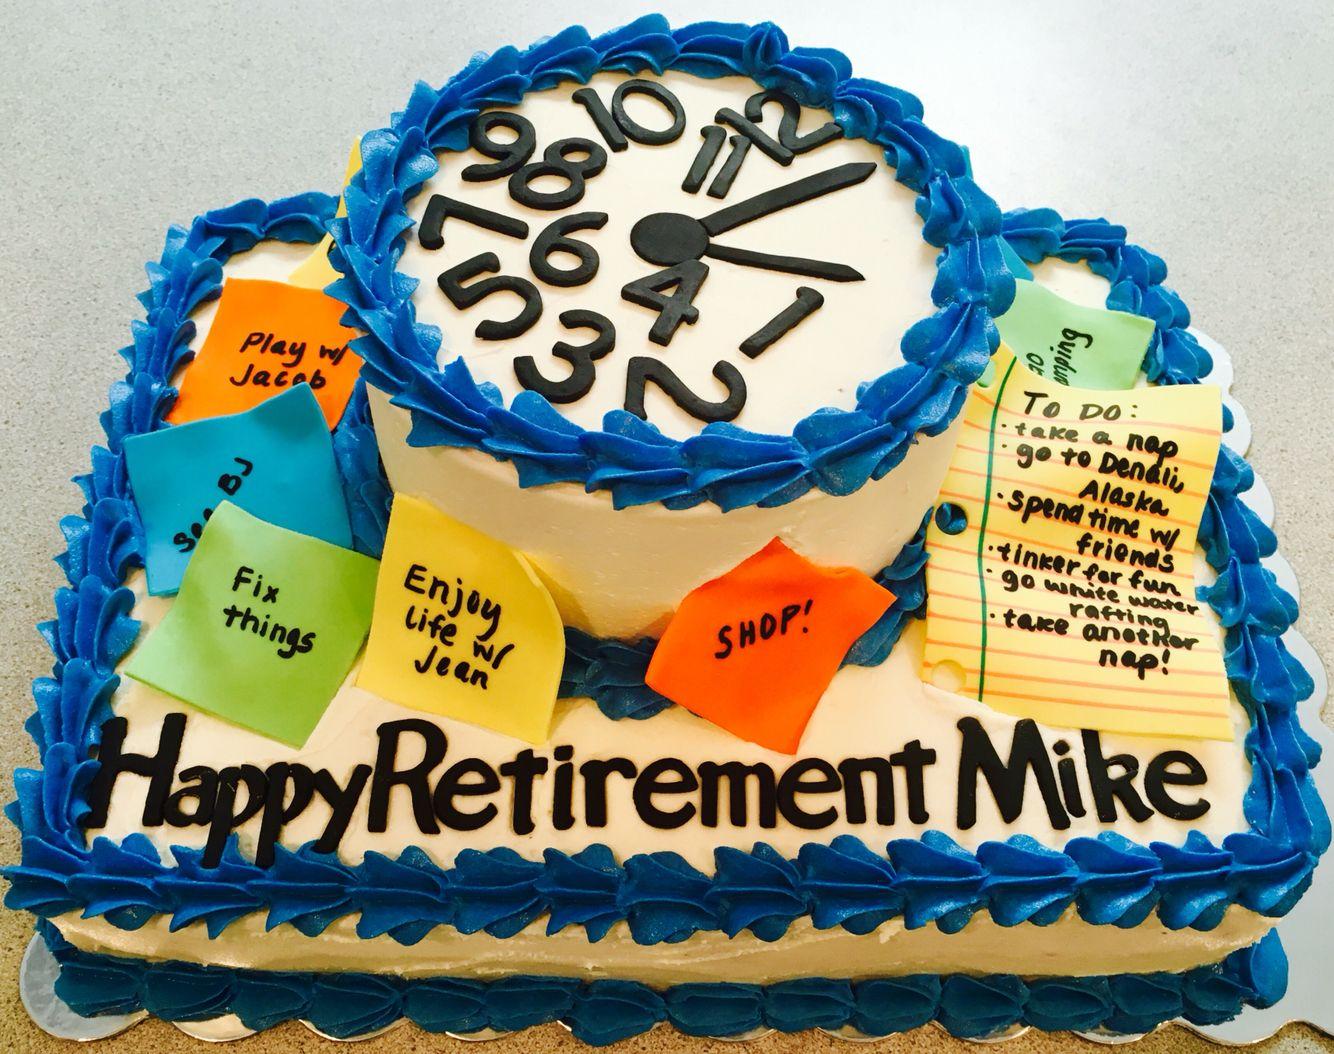 Clock Retirement Cake Visit Bubba Bellie S Creative Design On